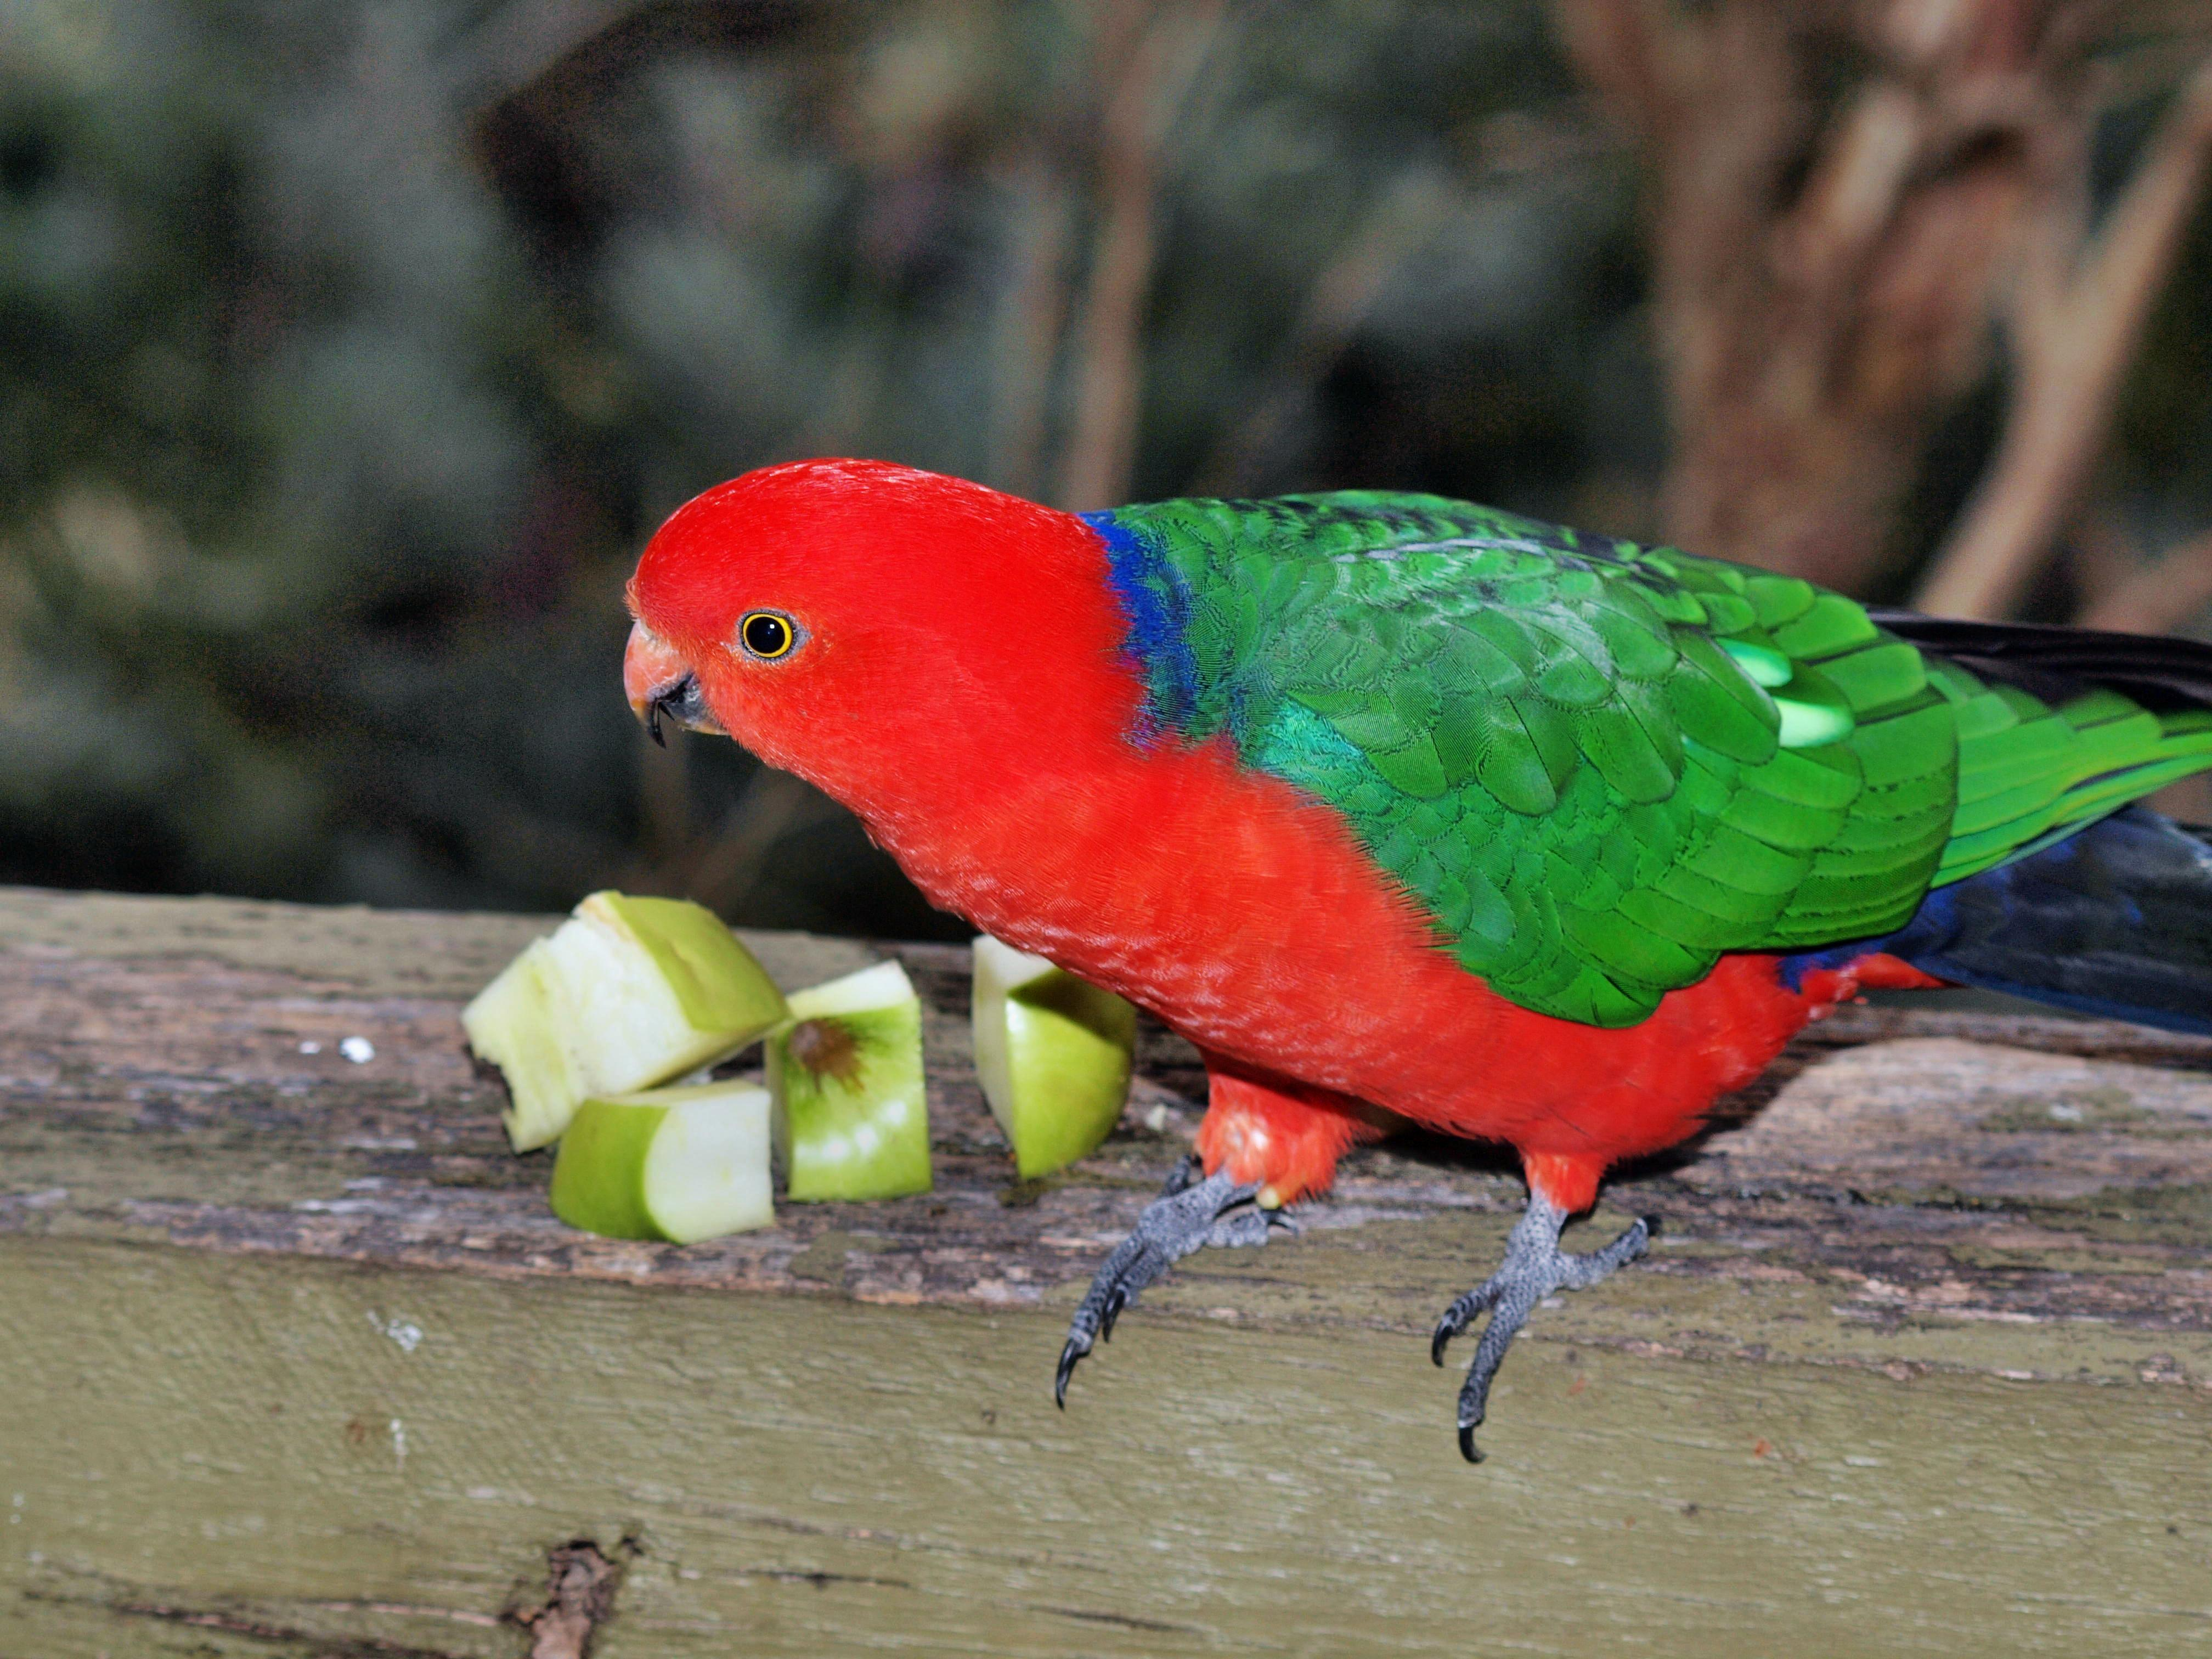 Parrot-12.jpeg